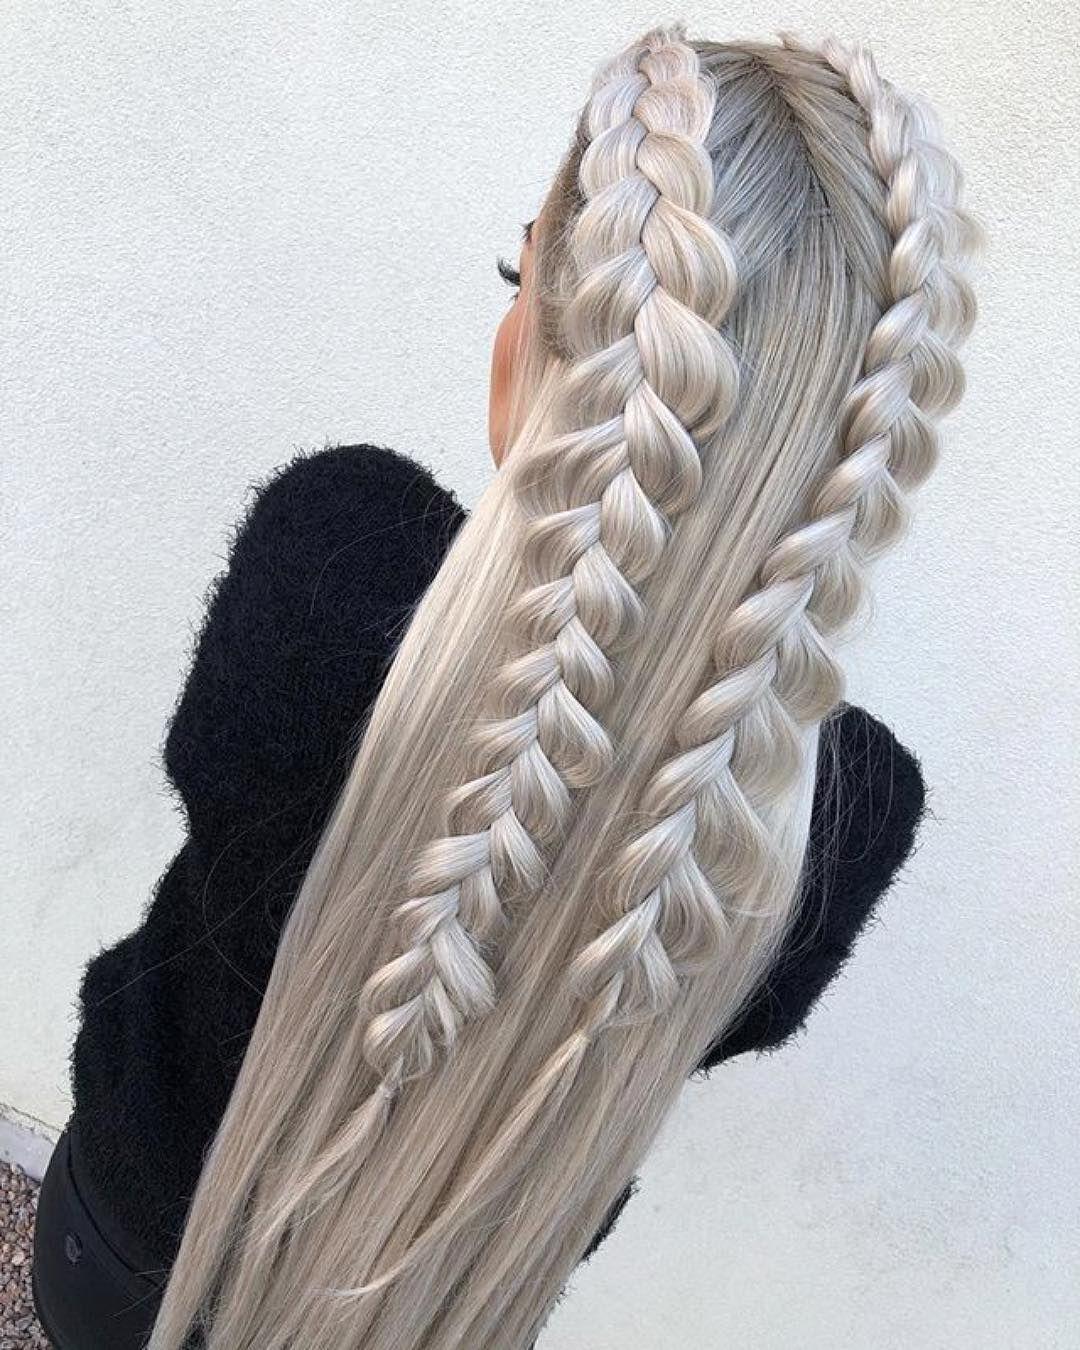 xxx-tiana-pics-cute-blonde-want